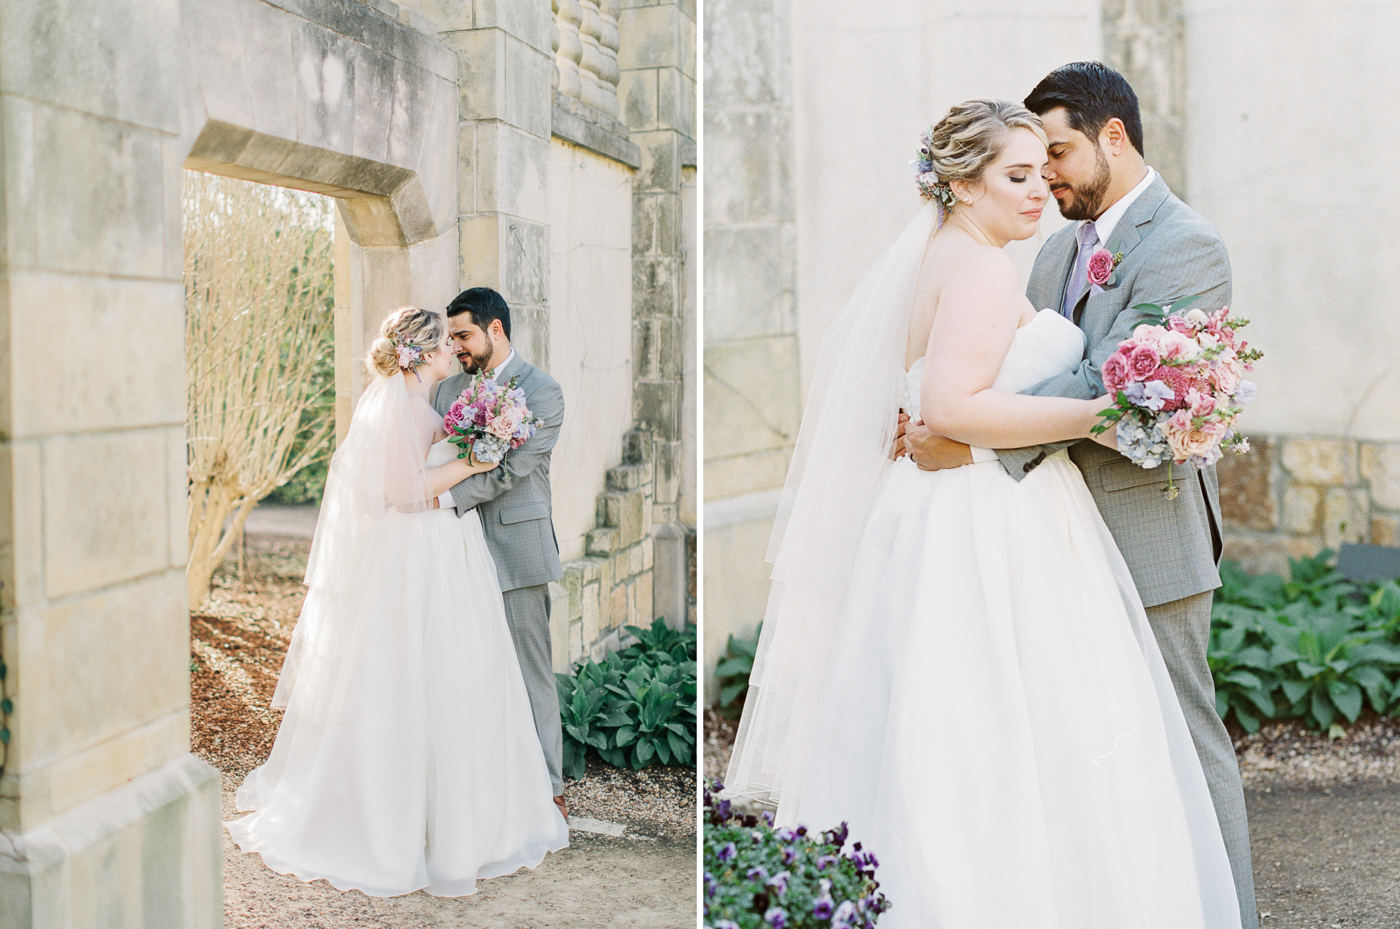 Dallas Arboretum & Botanical Garden Wedding Photos - Fine Art Film Photography